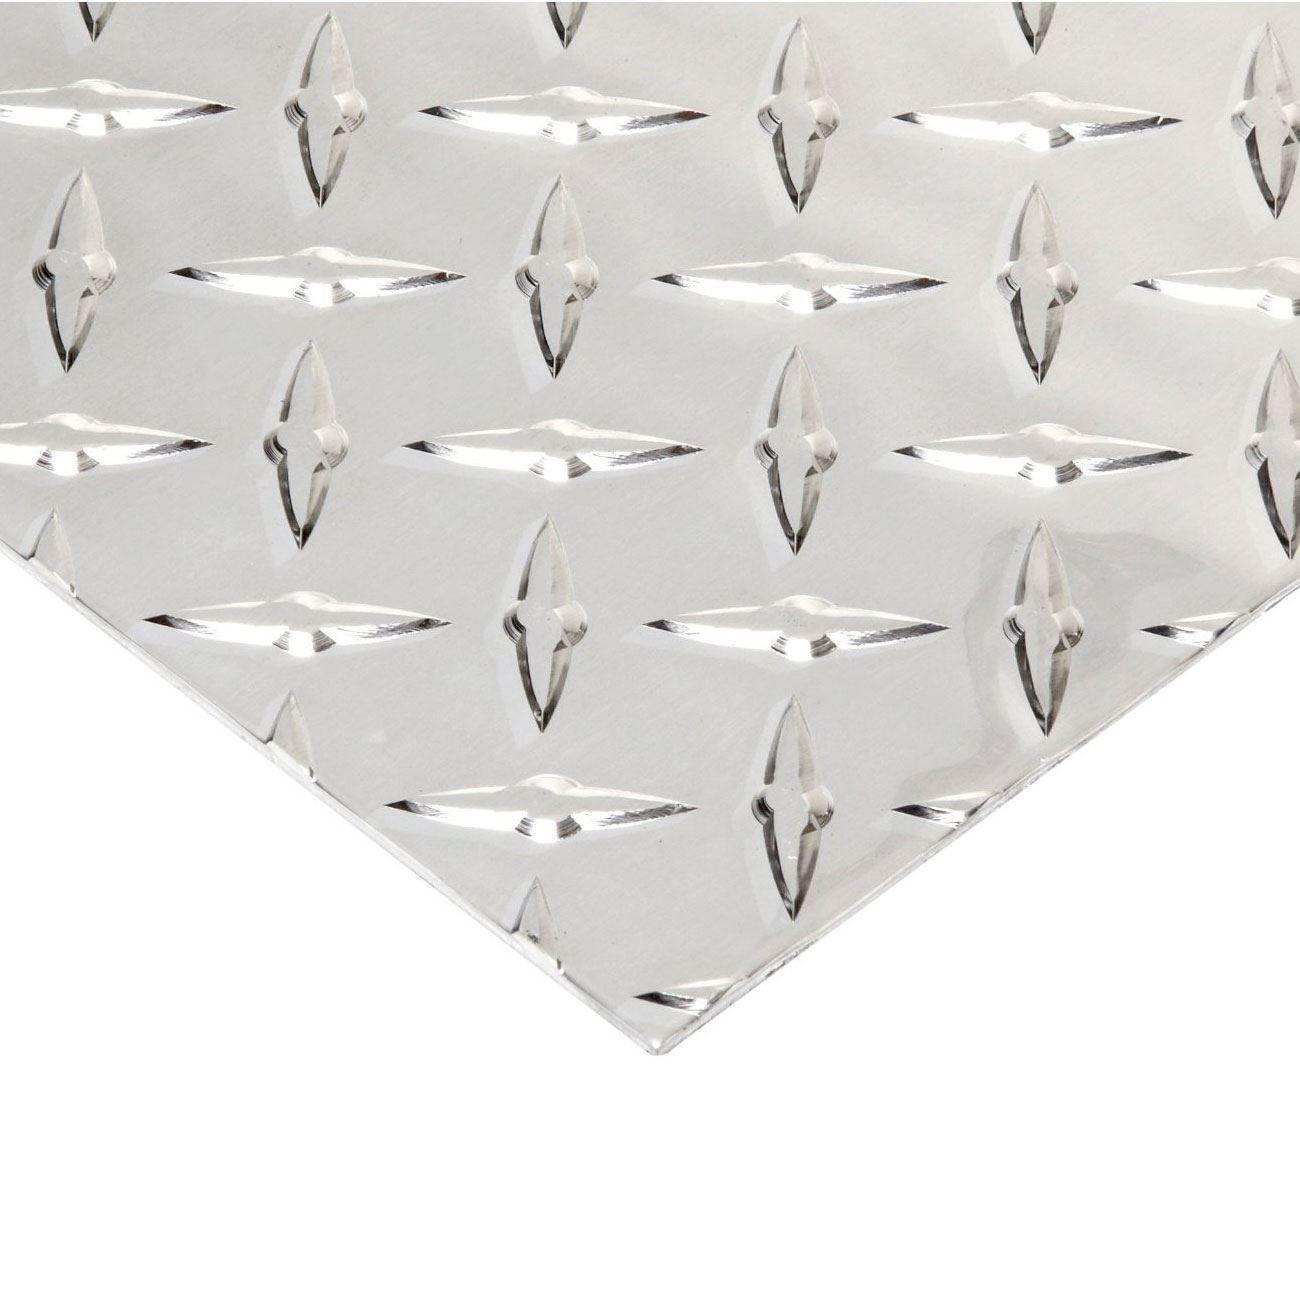 "24-ga TREAD BRITE .025/"" x 24/""x 24/"" DIAMOND PLATE"